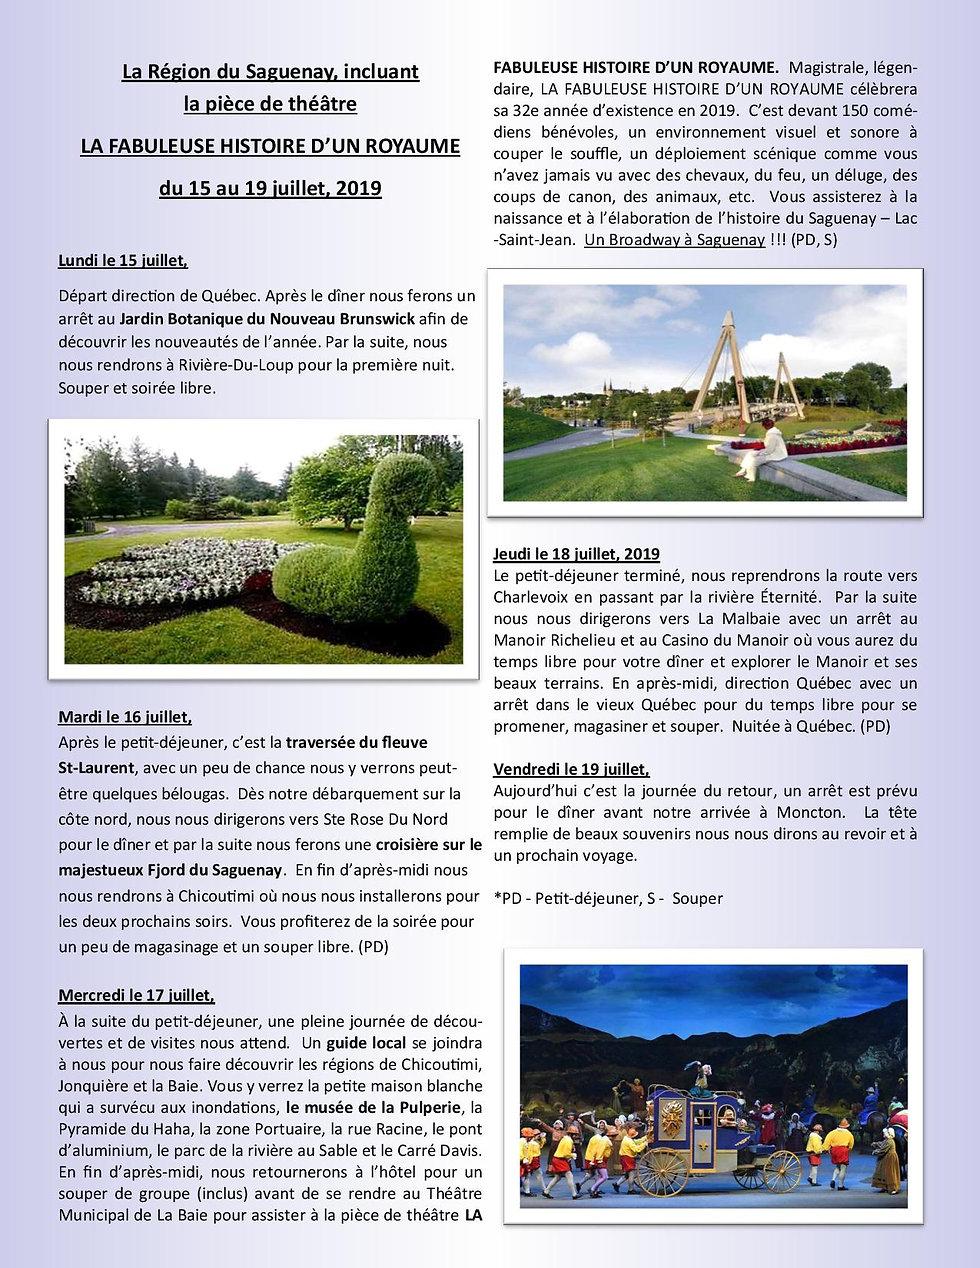 Depliants Saguenay 2019-page-002.jpg